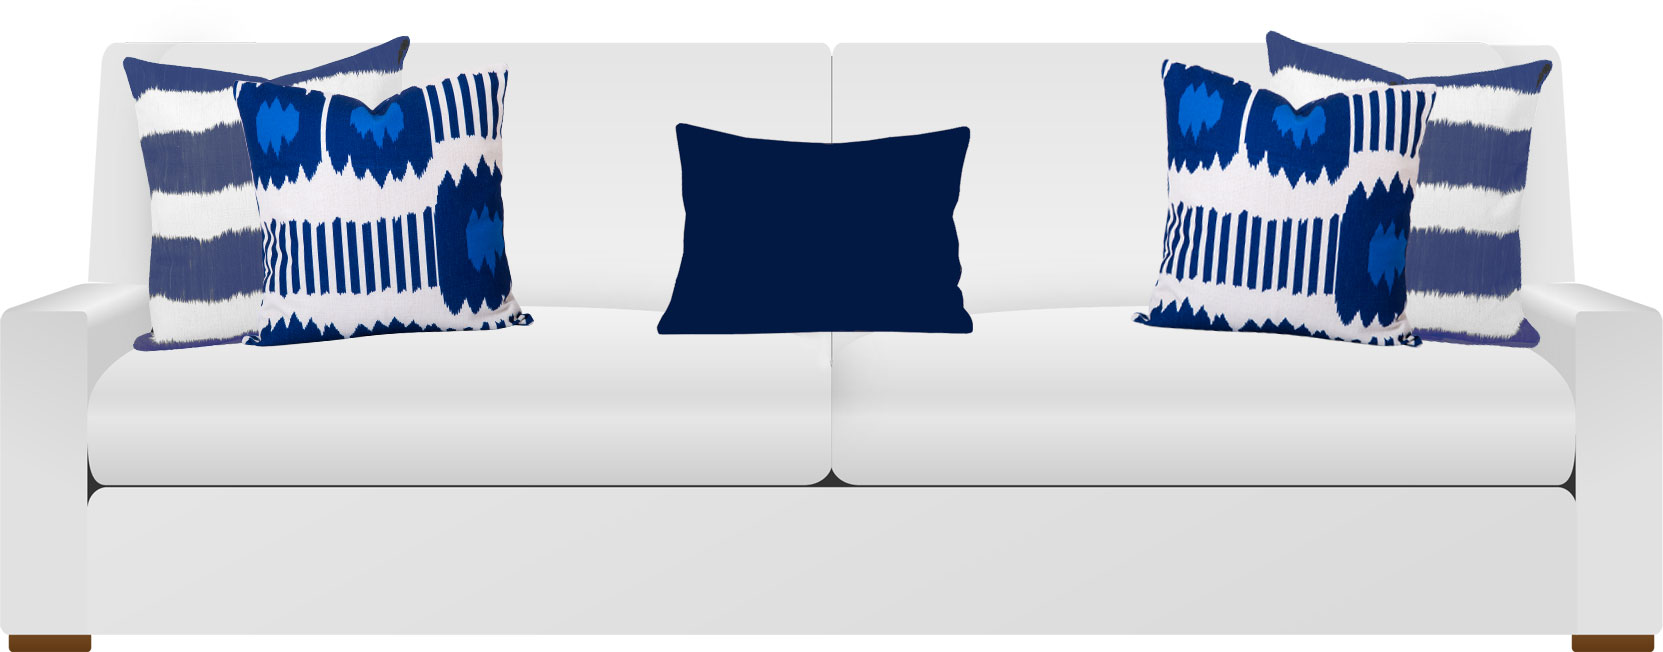 White Sofa with 5 blue ikat cushions